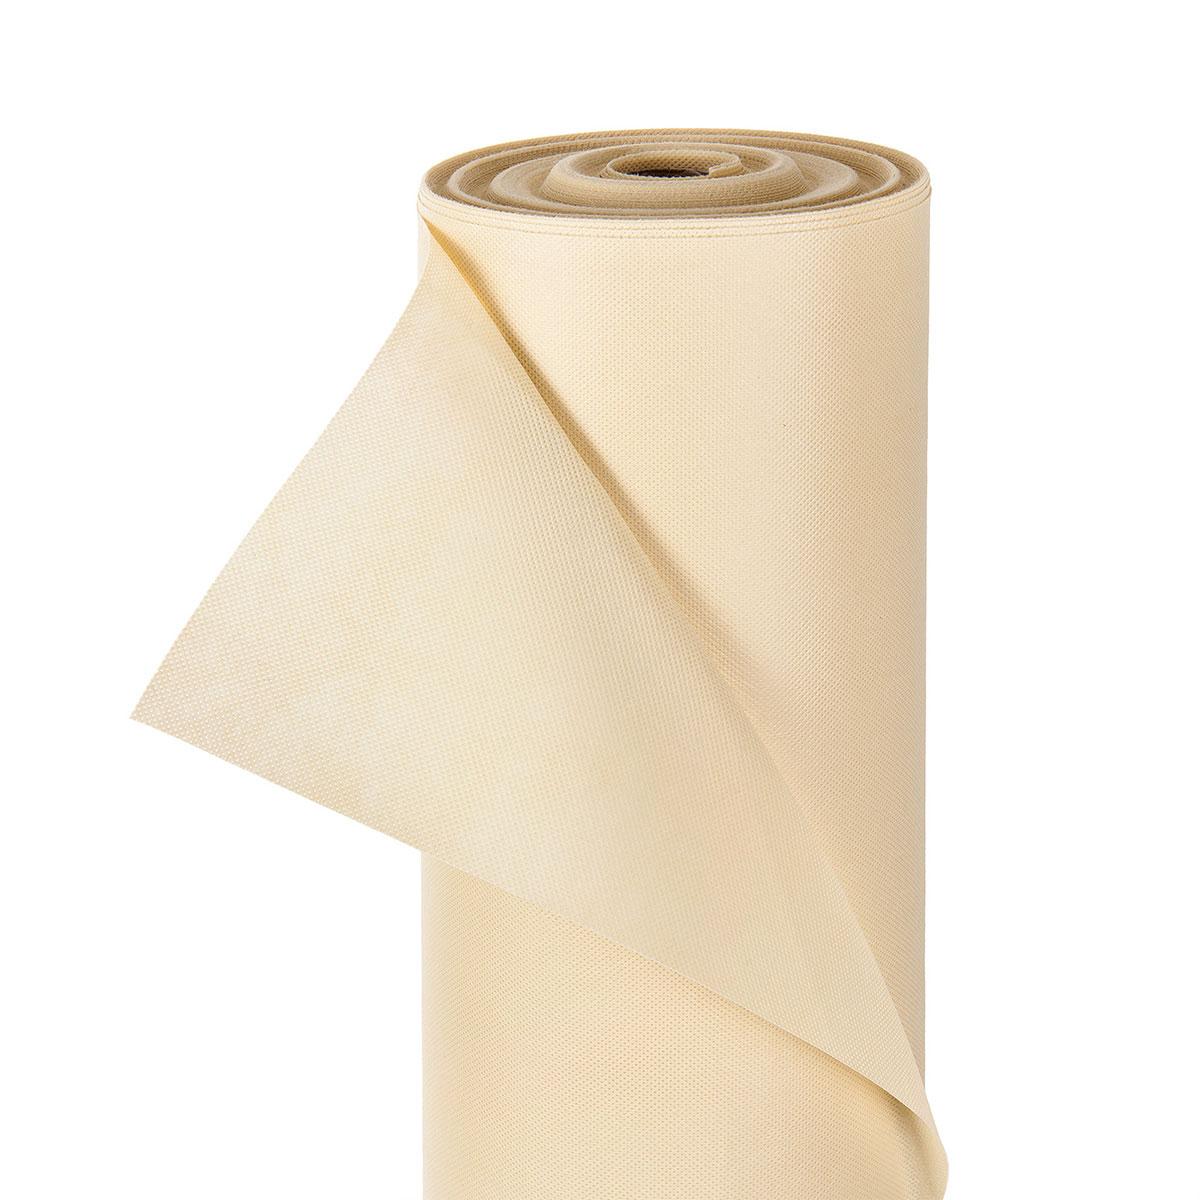 dekovlies in 1 6m breite beige meterware dekostoff vlies. Black Bedroom Furniture Sets. Home Design Ideas